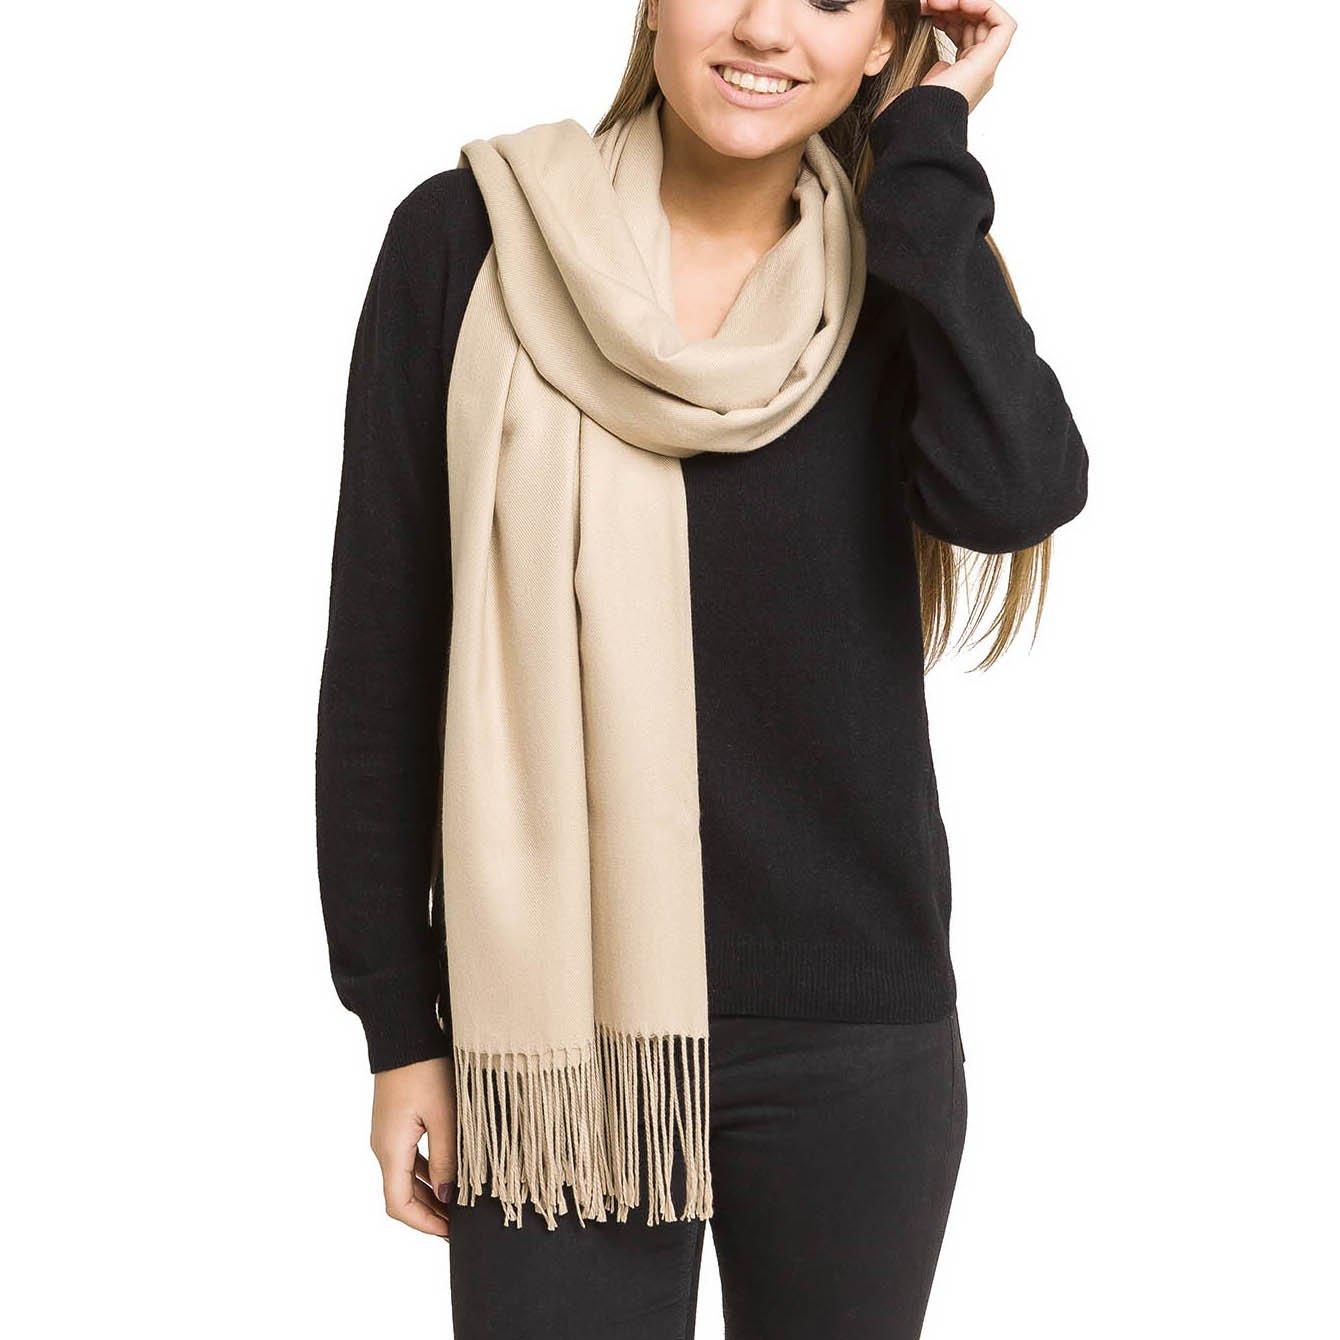 Kleidung & Accessoires Womens Lady Winter Warm Tartan Check Neck Shawl Scarf Wrap Stole Plaid Pashmina Clear-Cut-Textur Schals & Tücher